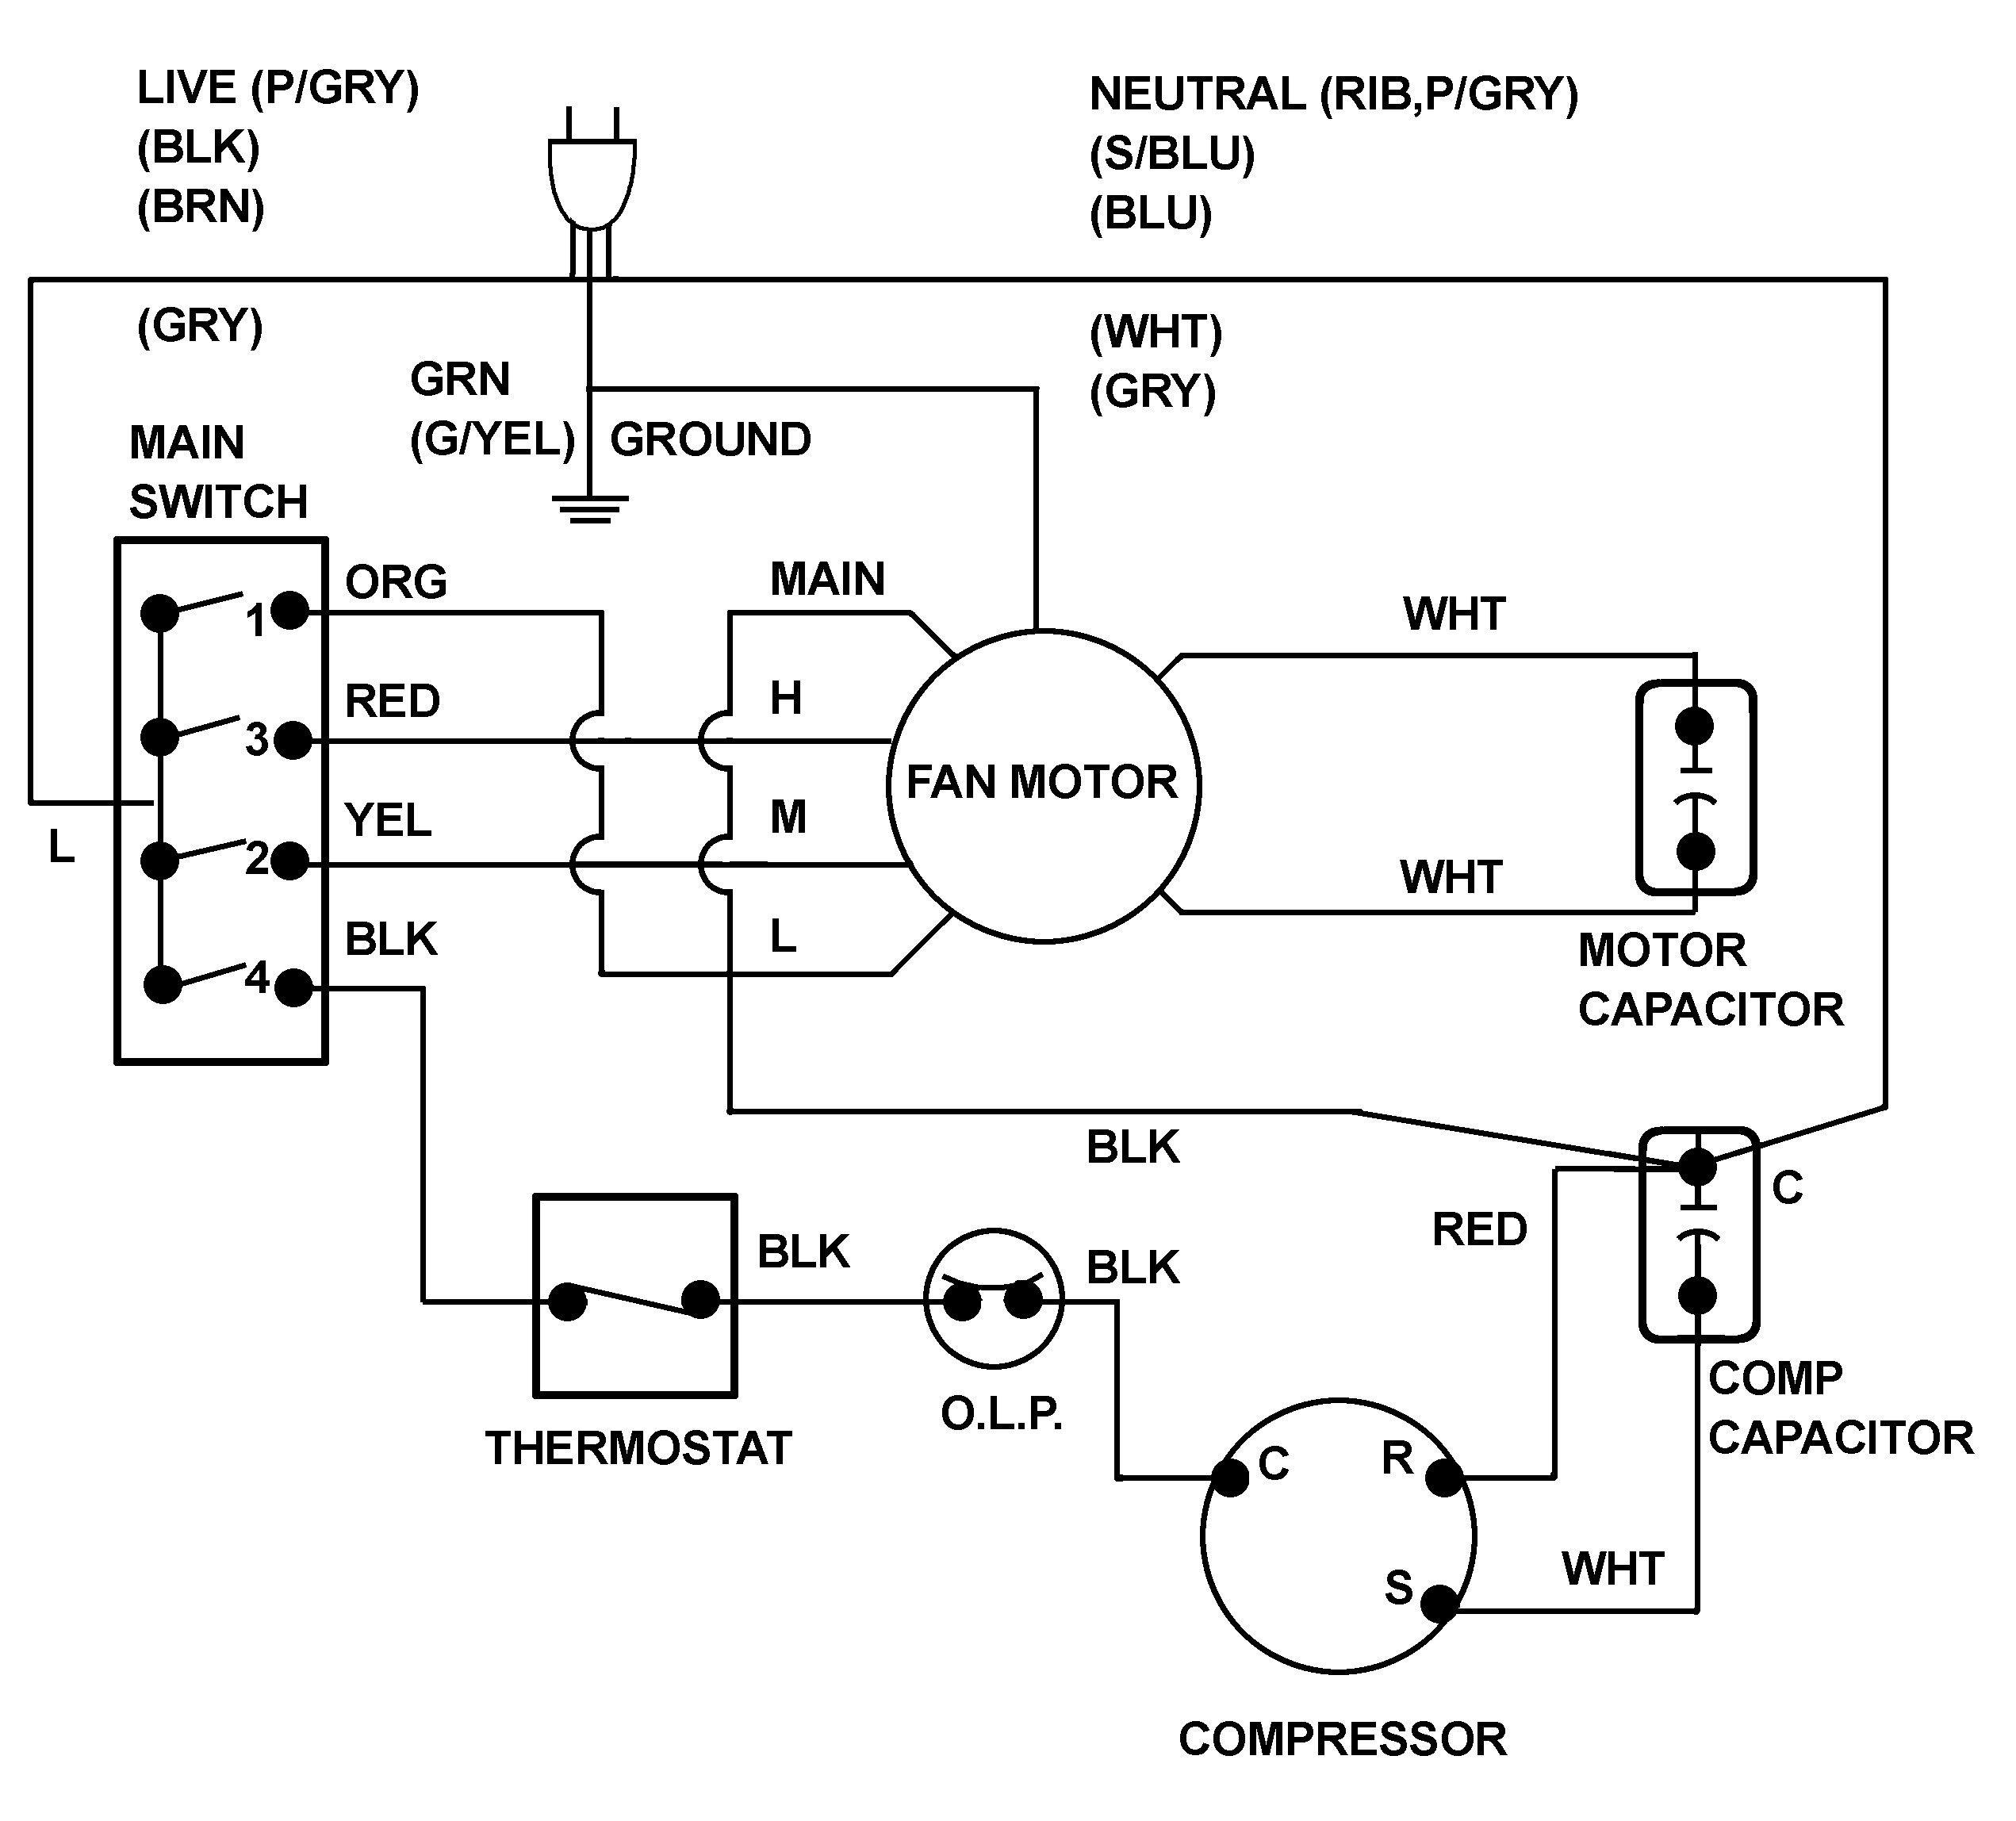 Unique Wiring Diagram Ac Panasonic Diagram Diagramtemplate Diagramsample Check More At Https Servisi Co Wiring Ac Wiring Thermostat Wiring Circuit Diagram